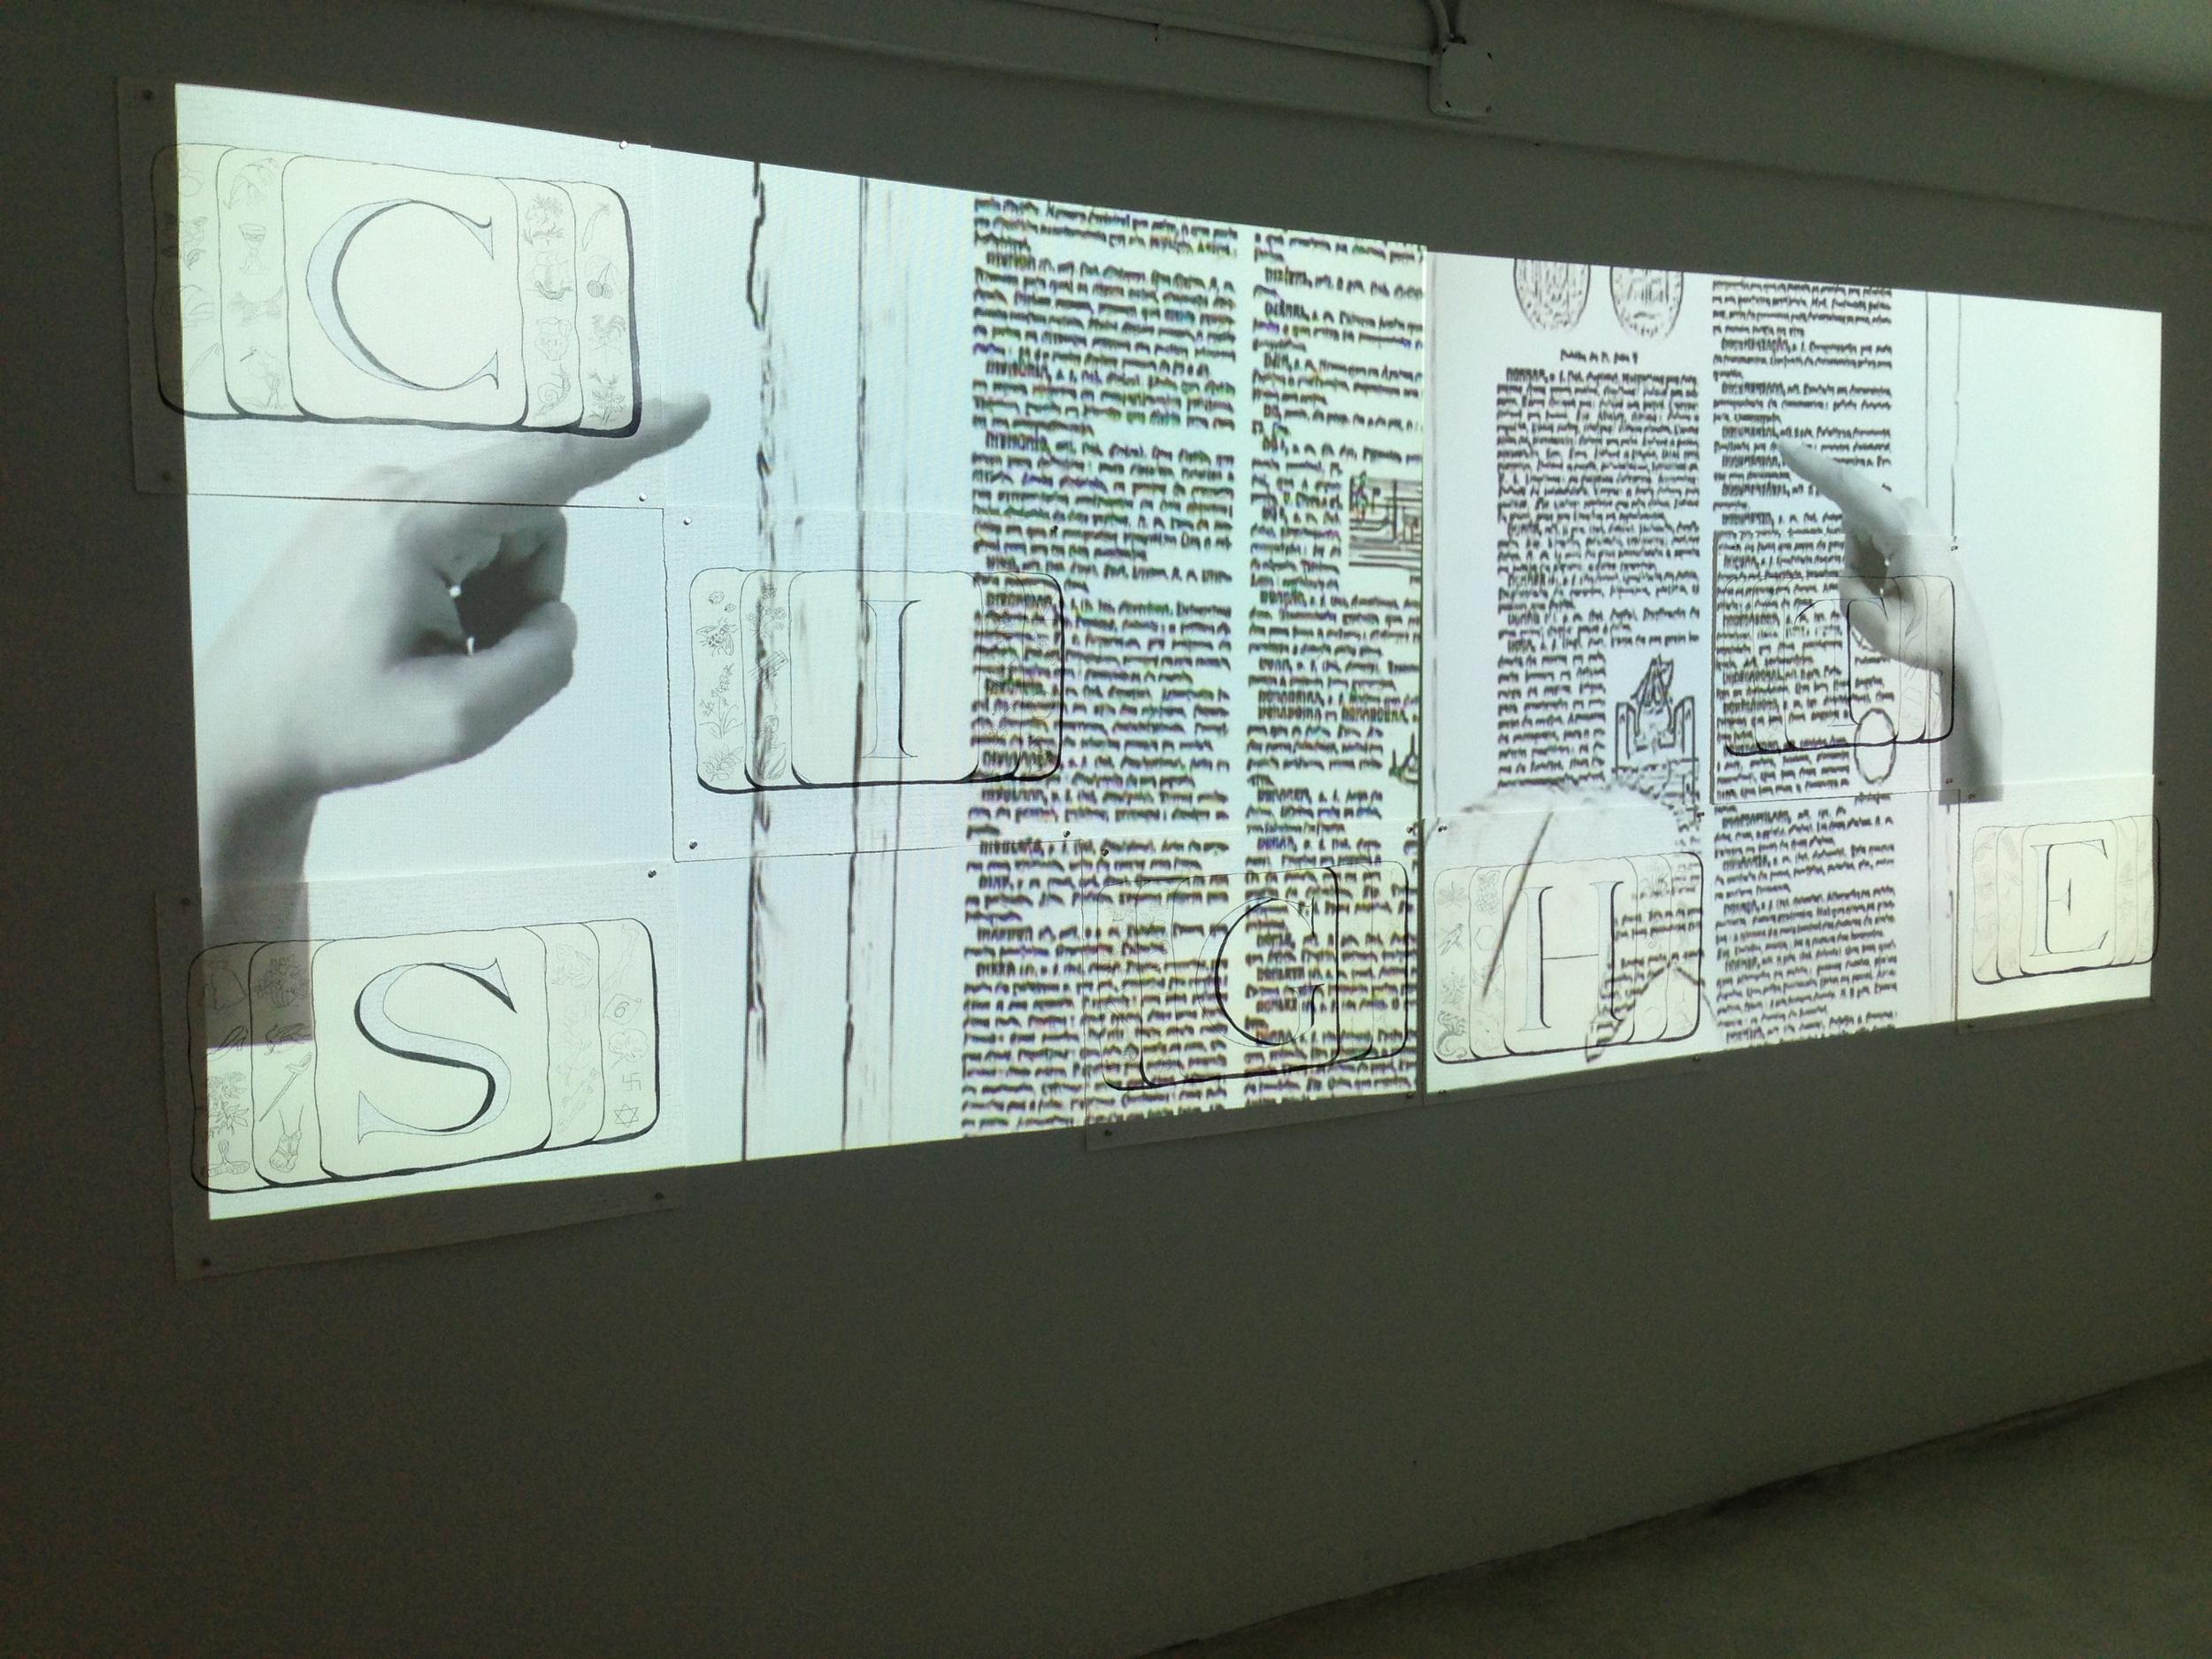 CITE SITE SIGHT installed at  Mi Casa Es Su Casa  (2013)  exhibition at Butter Gallery, Miami, FL, during Basel Week.